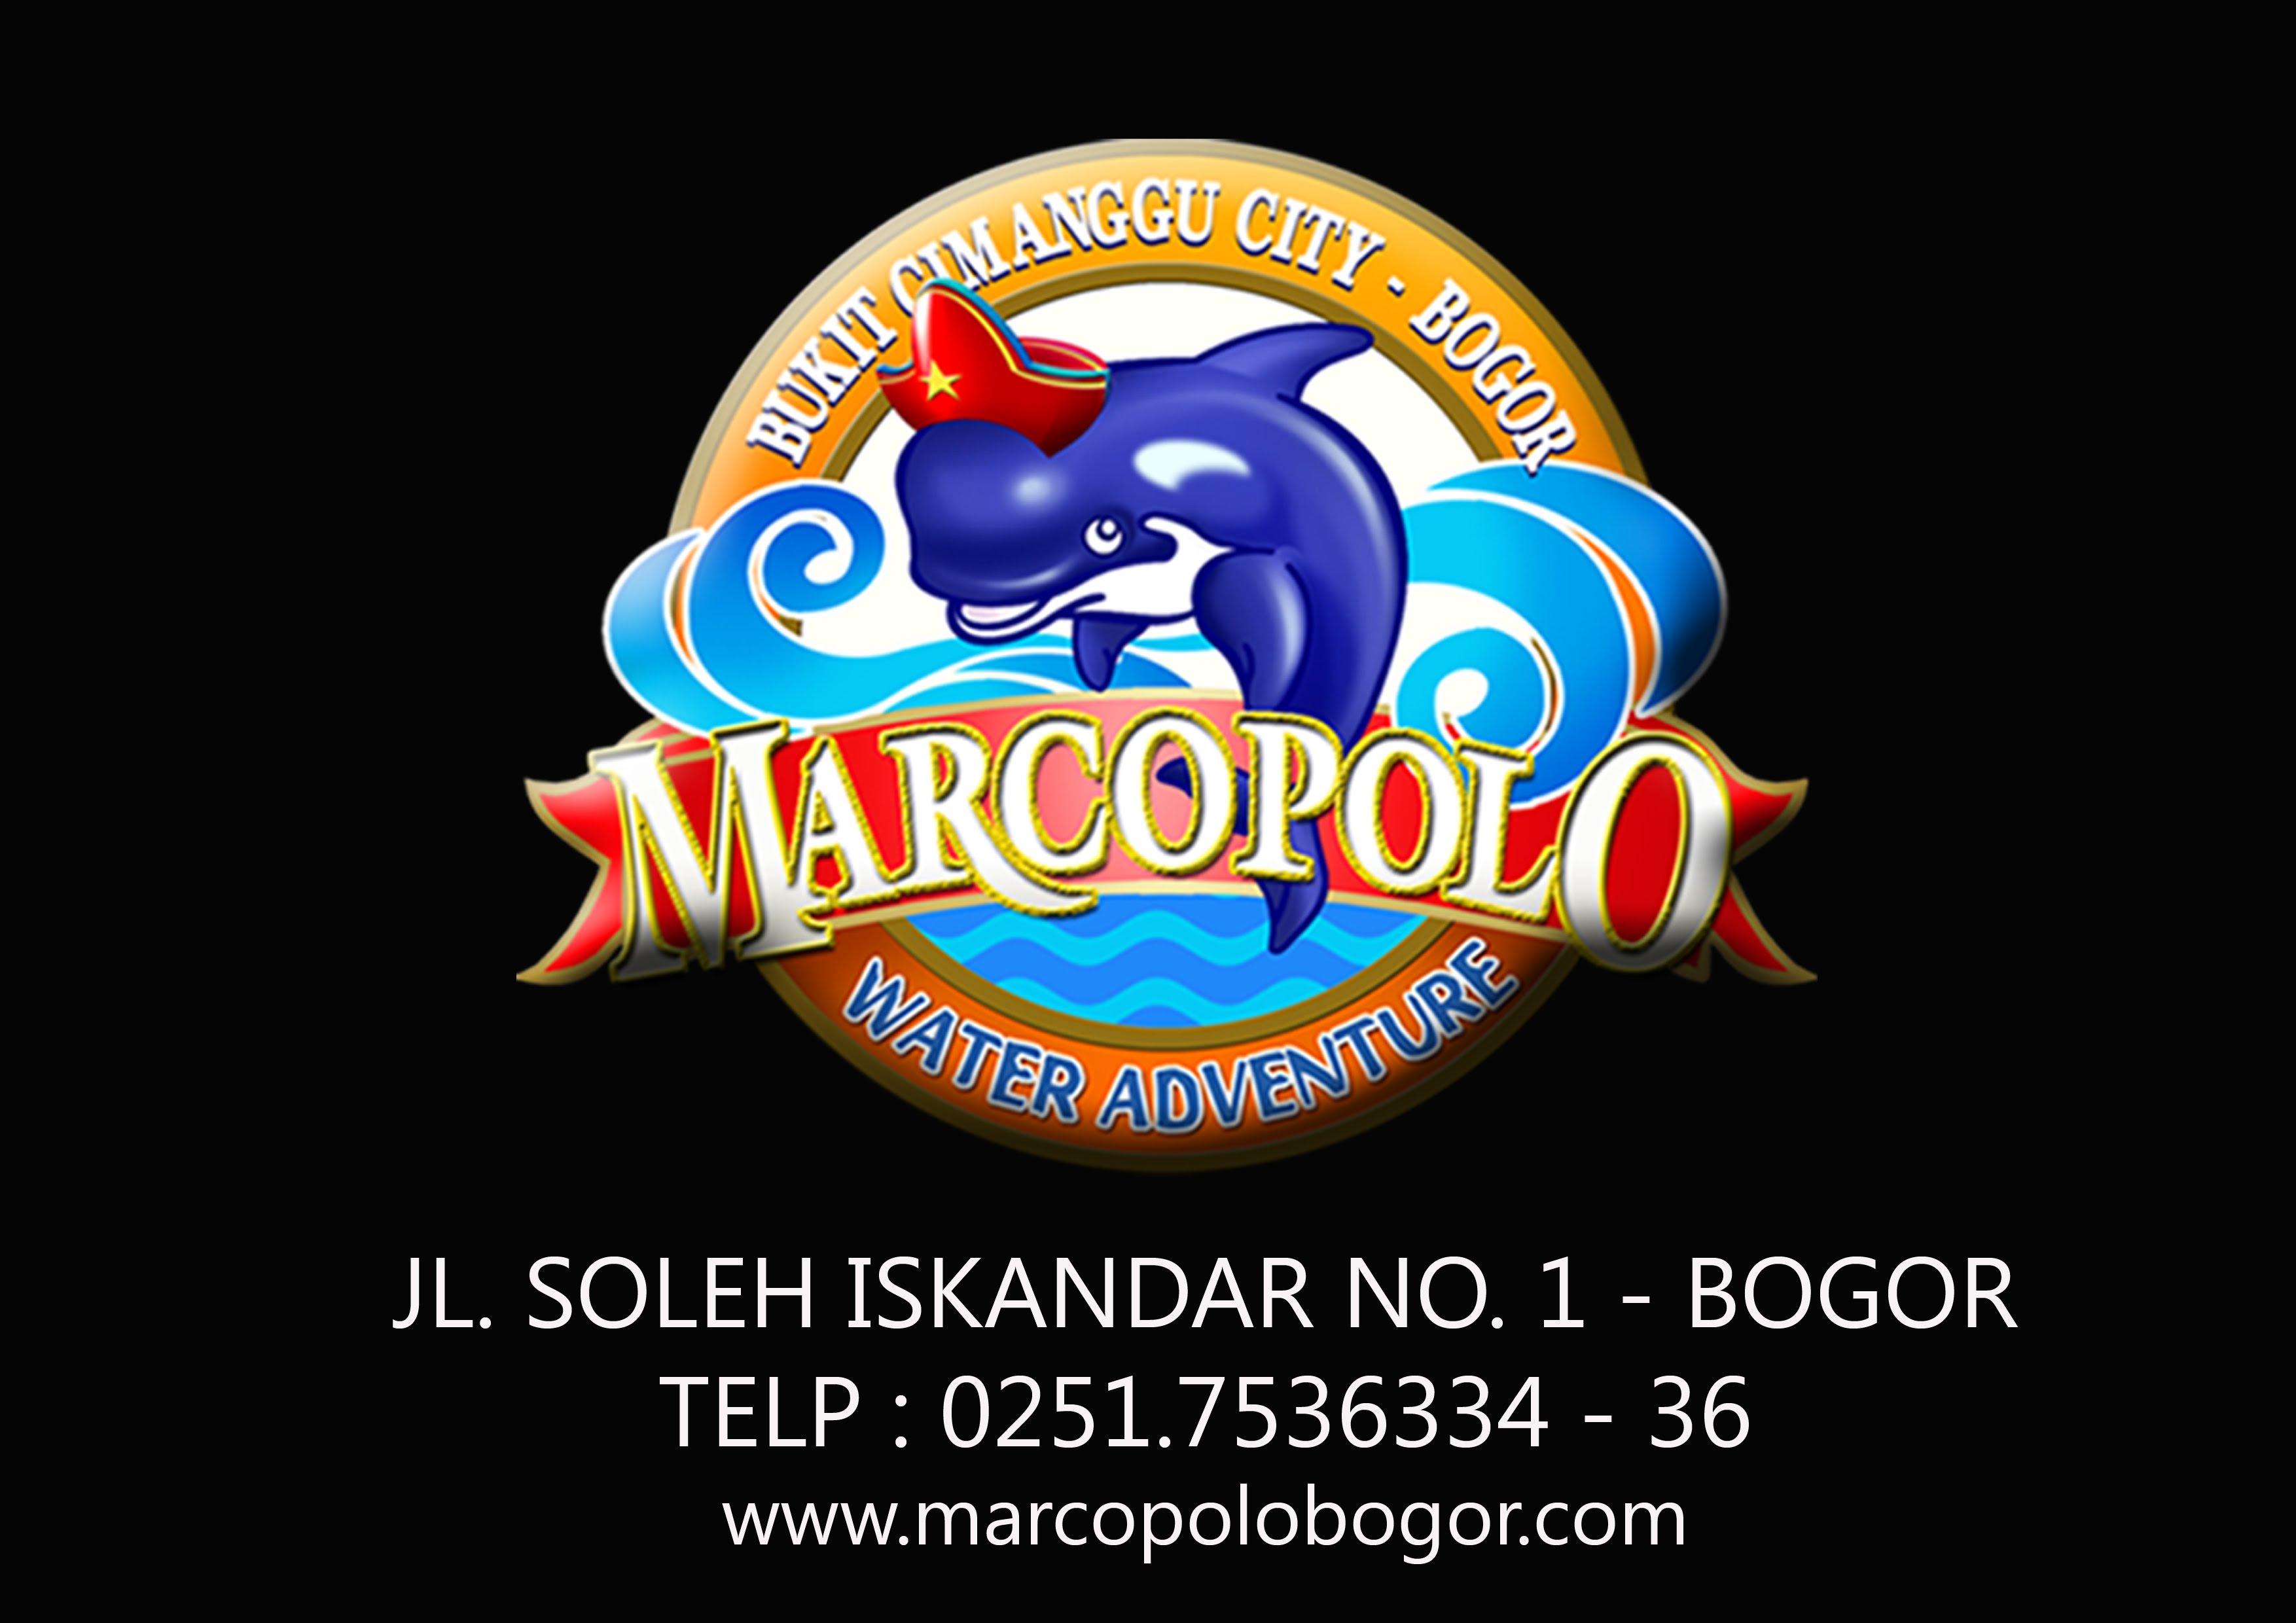 Marcopolo Water Adventure Bogor Youtube Kab